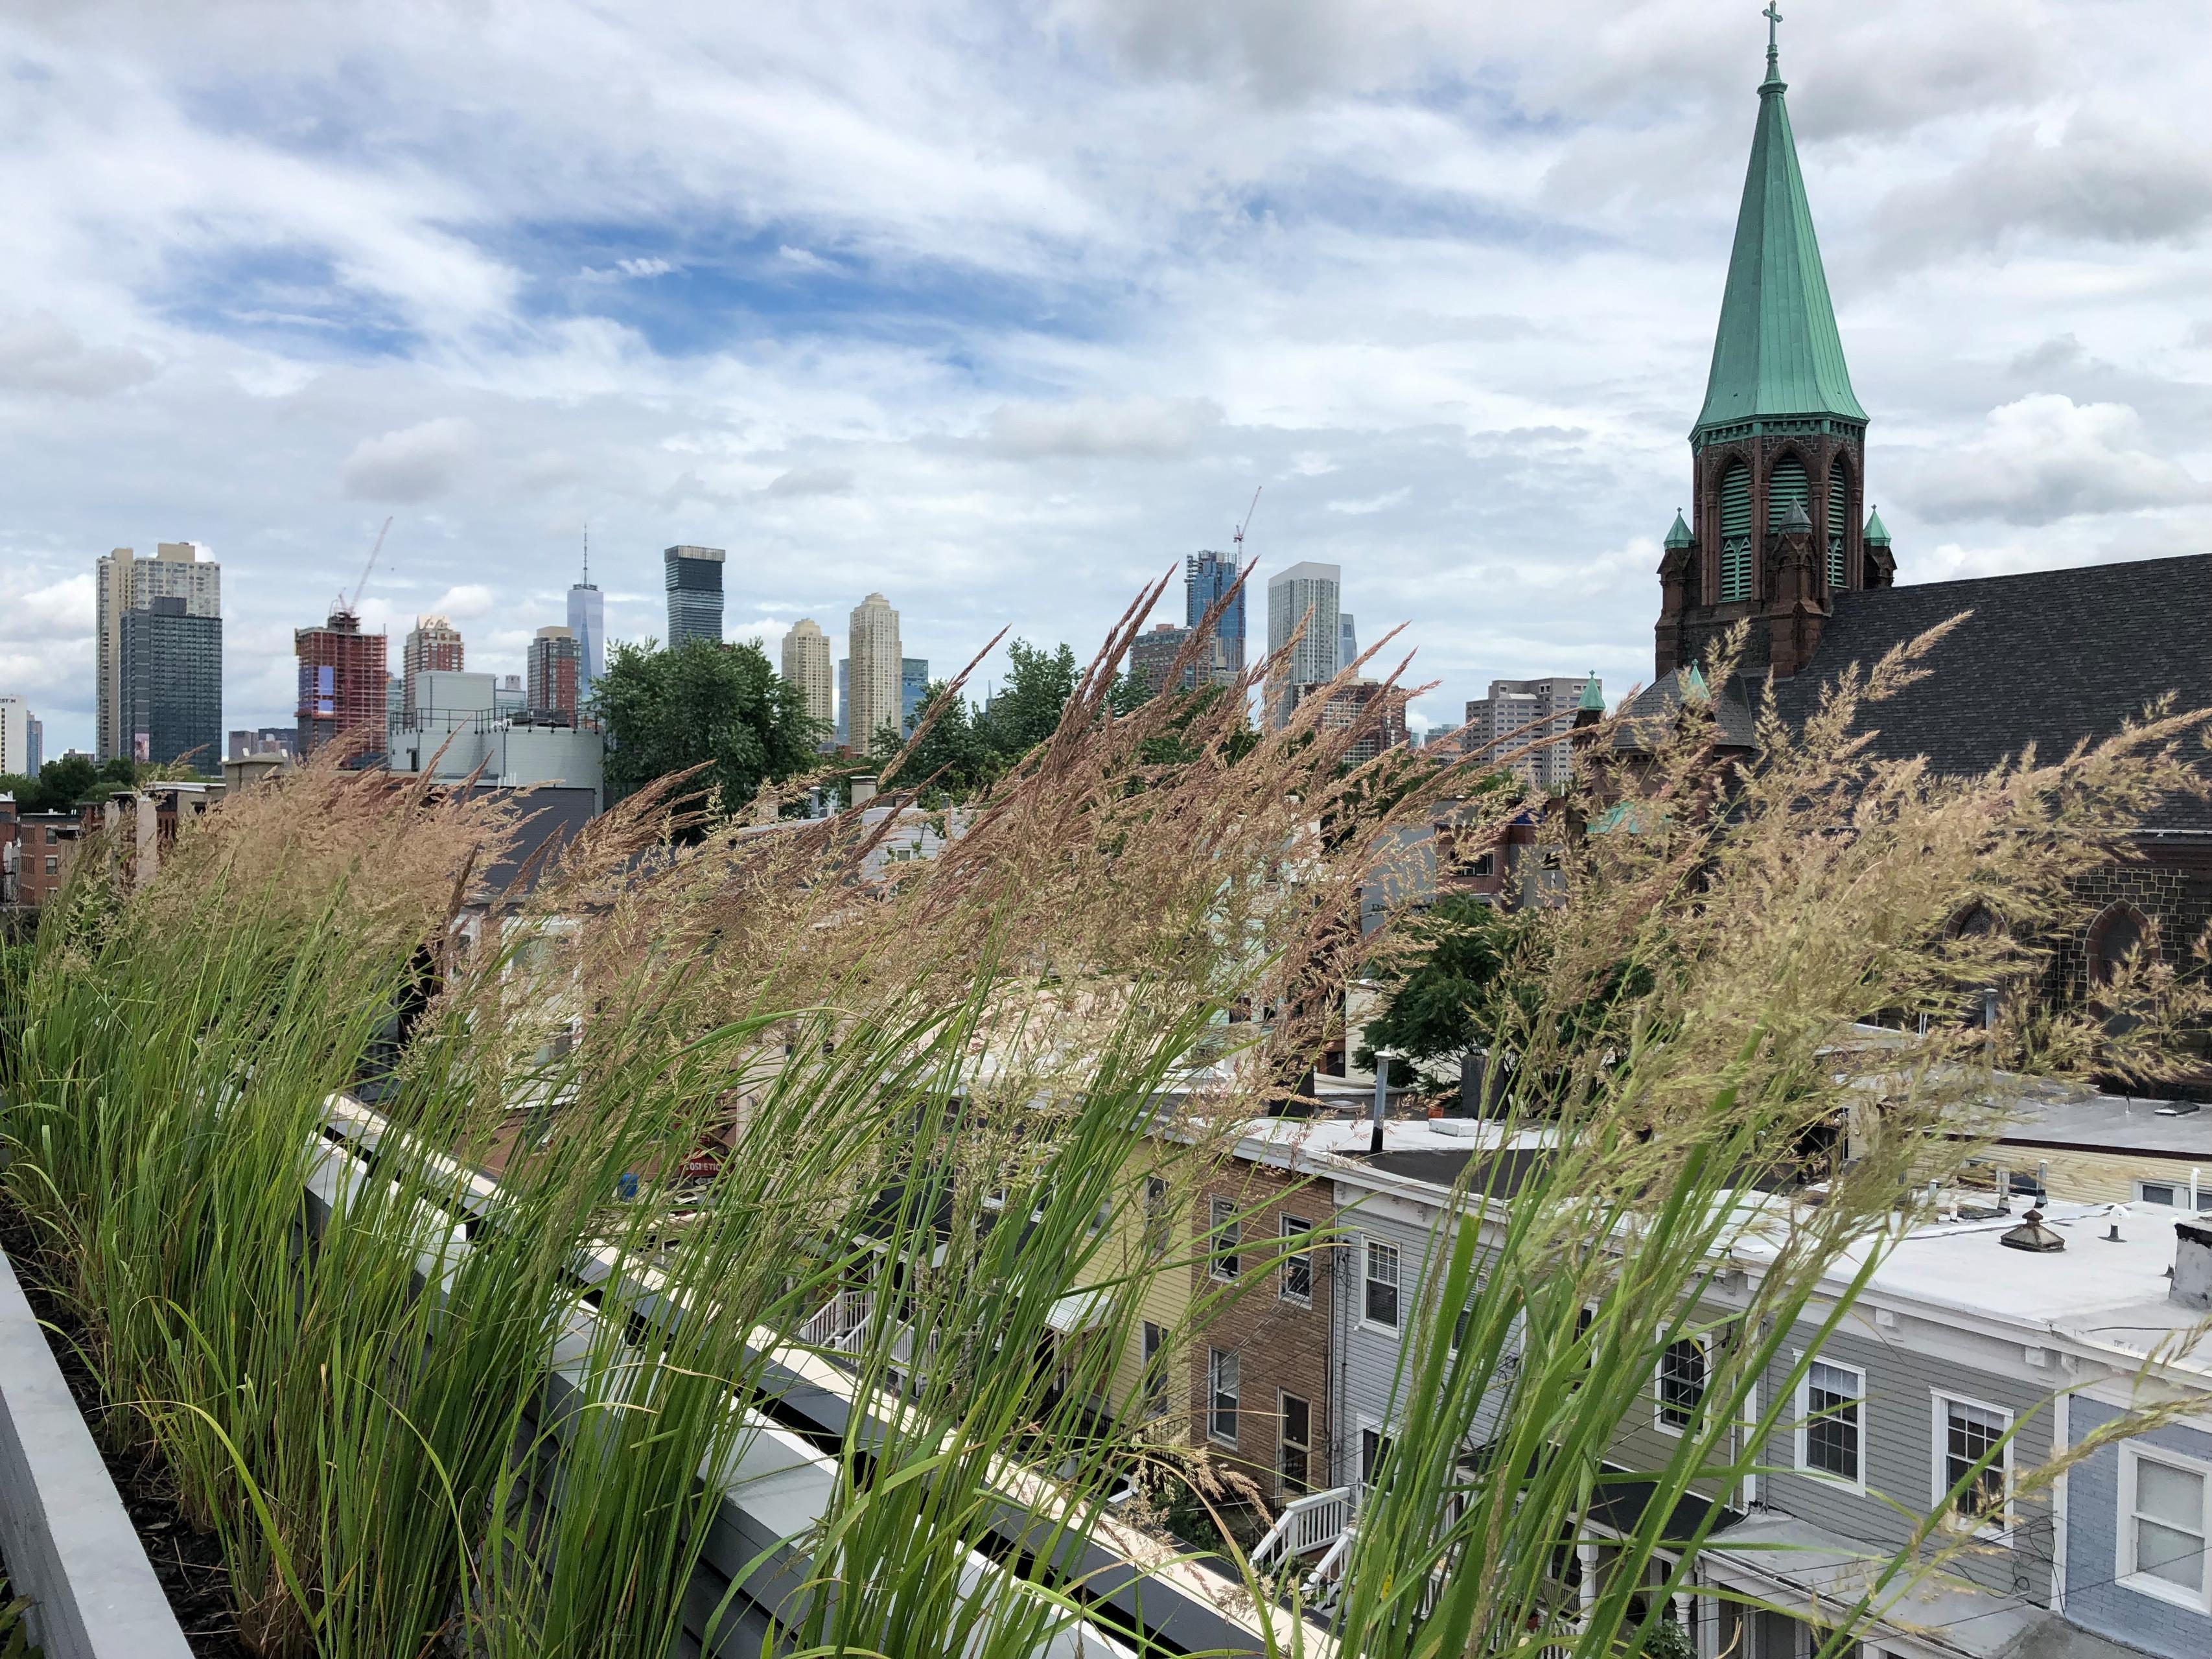 Jersey City Roof Garden